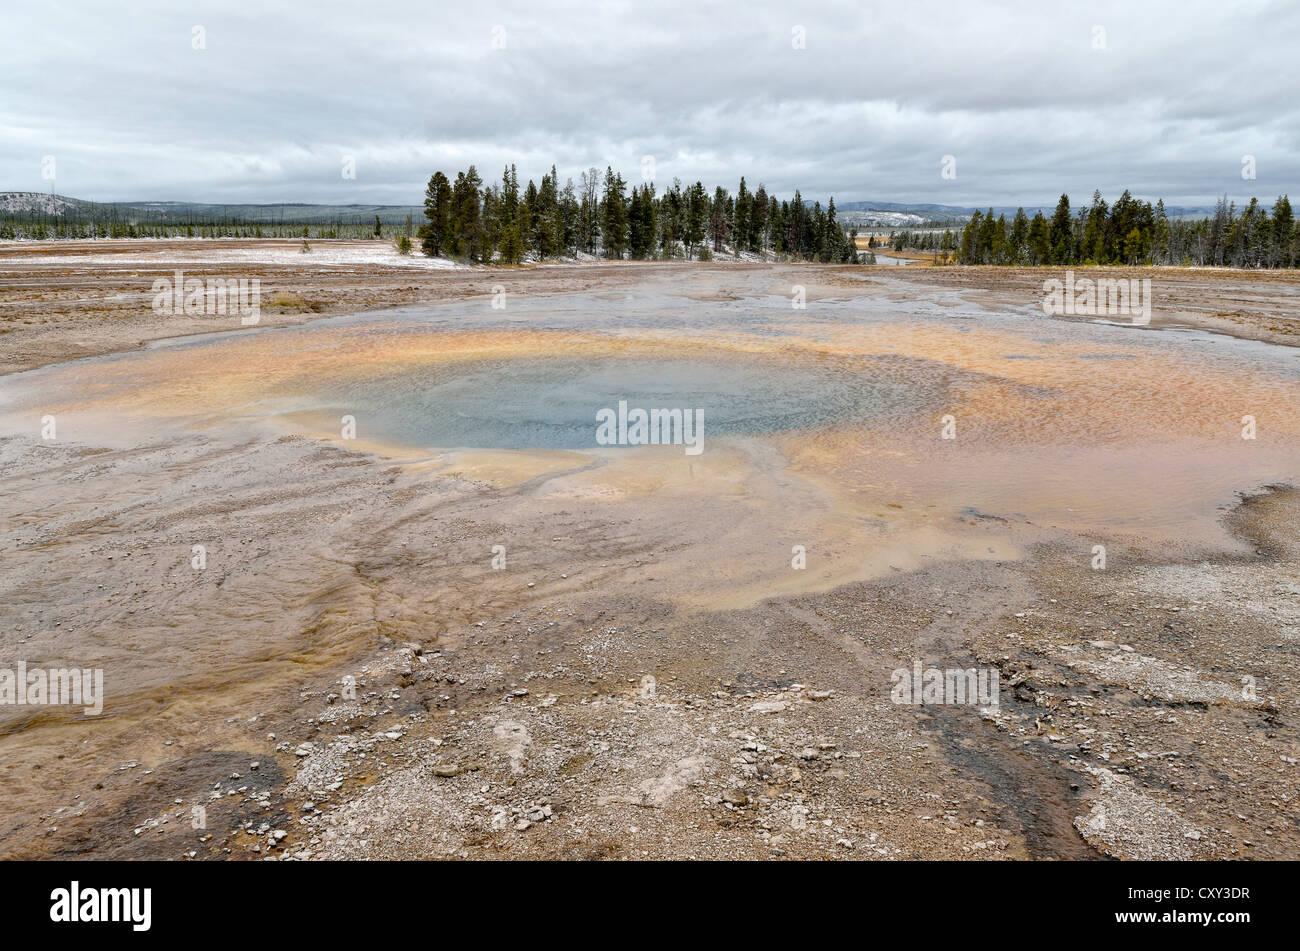 Opal Pool, Midway Geyser Basin, Yellowstone National Park, Wyoming, USA Stock Photo